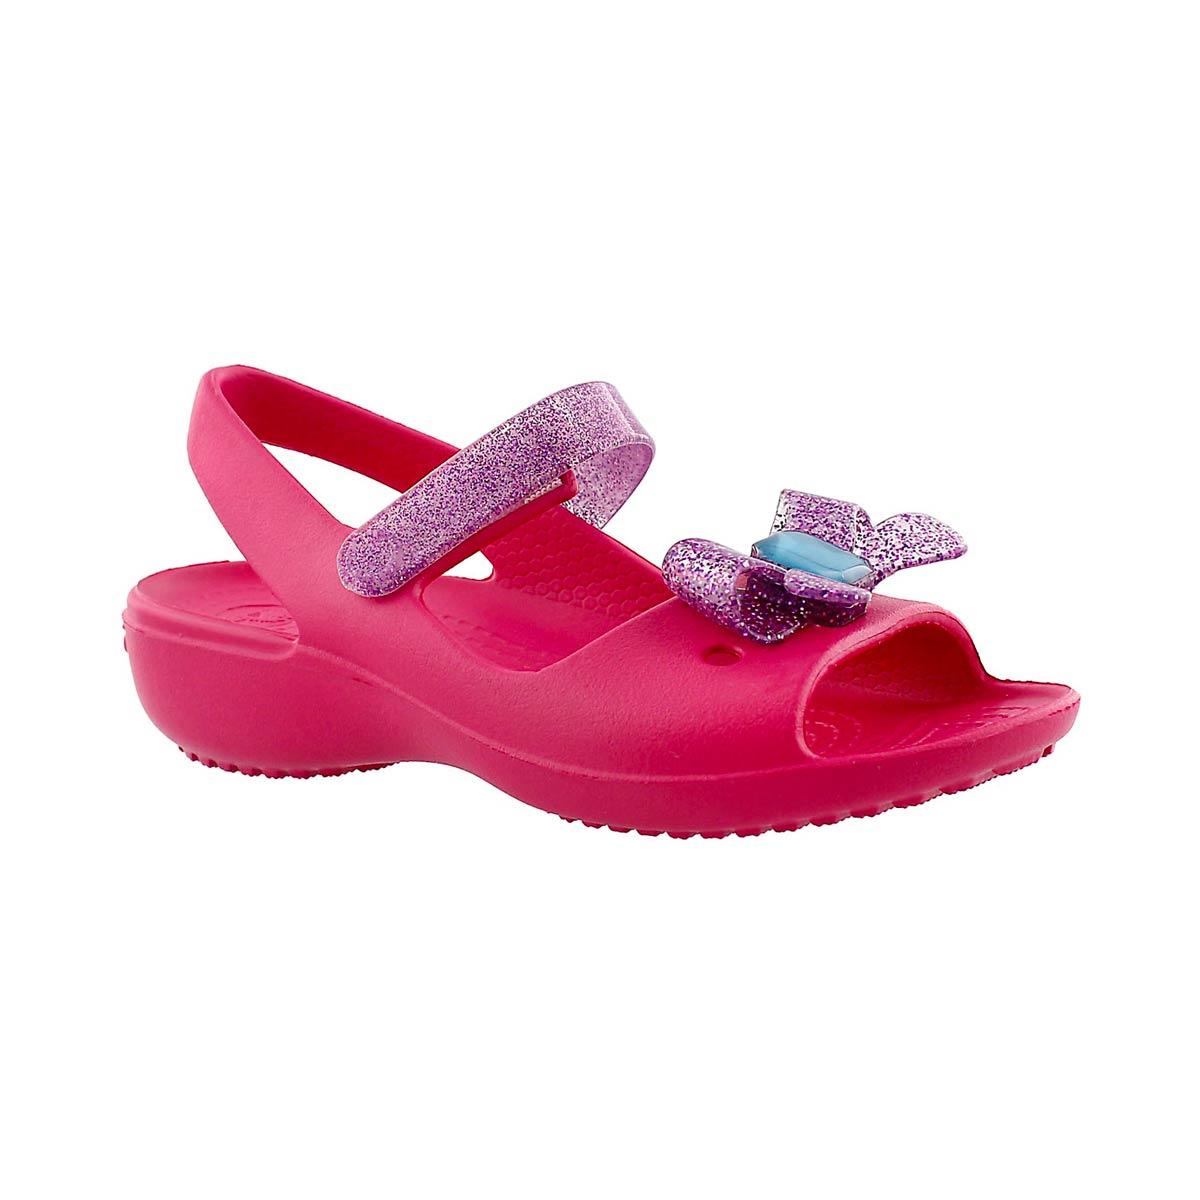 Girls' KEELEY SPRINGTIME MINI WEDGE sandals